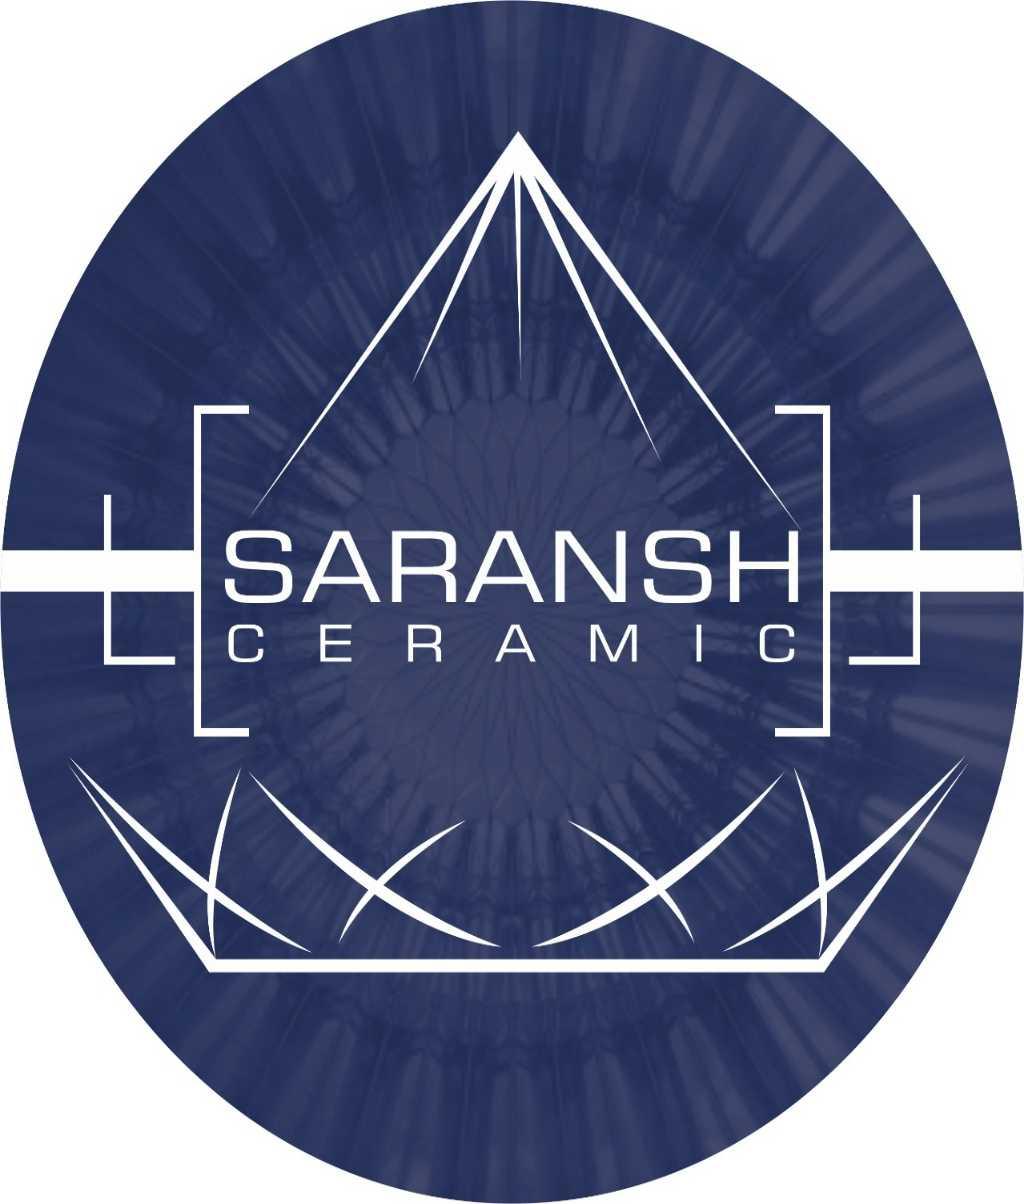 SARANSH CERAMIC